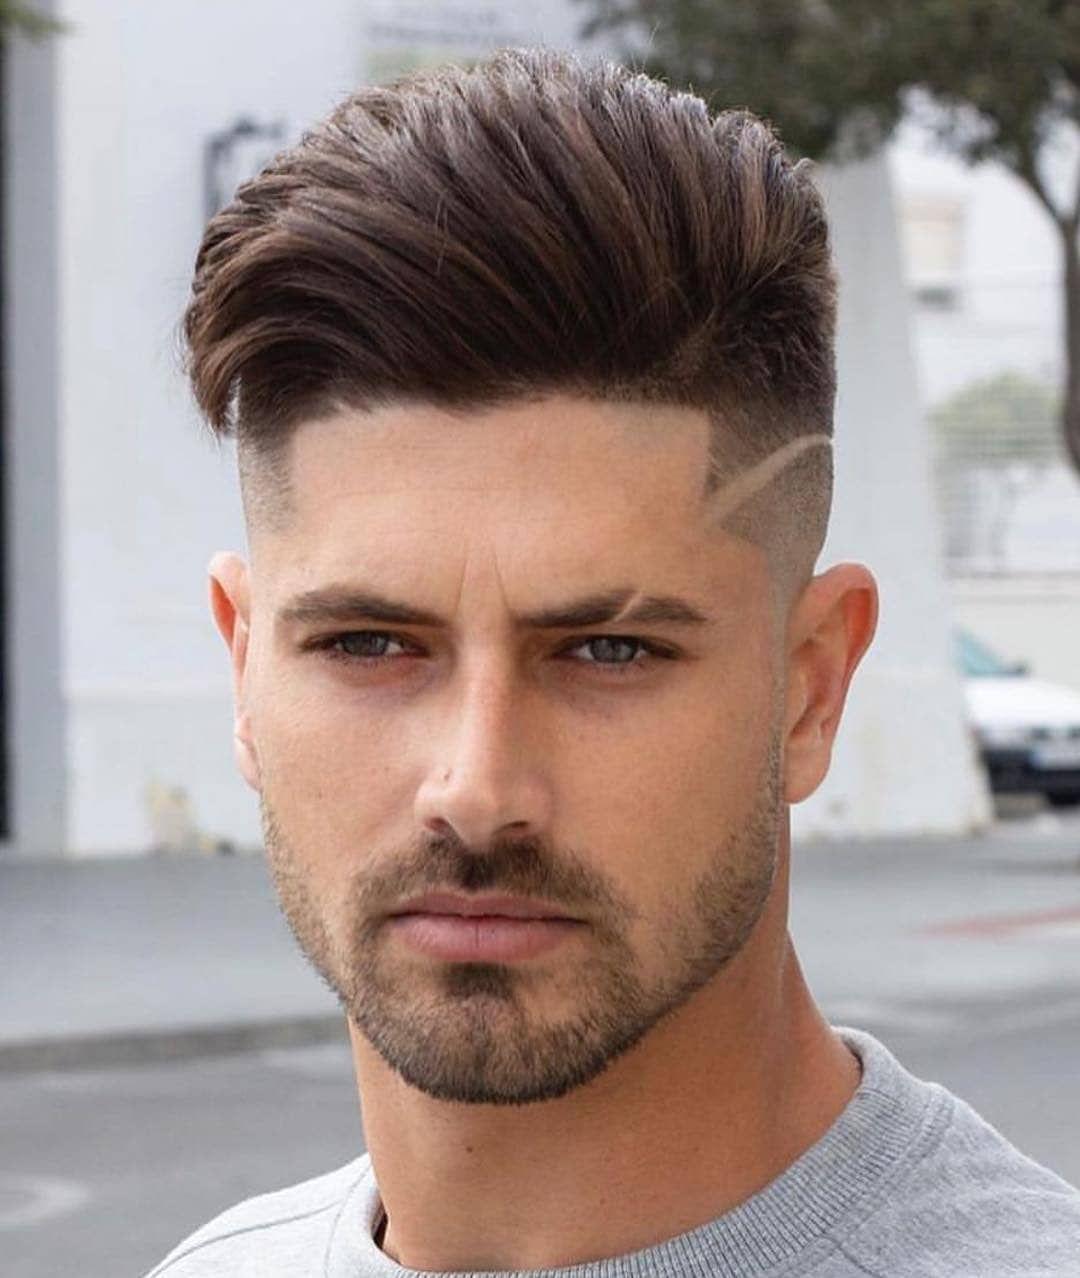 Skin Fade W Infinite Line Cool Hairstyles For Men Fade Haircut Men Haircut Styles